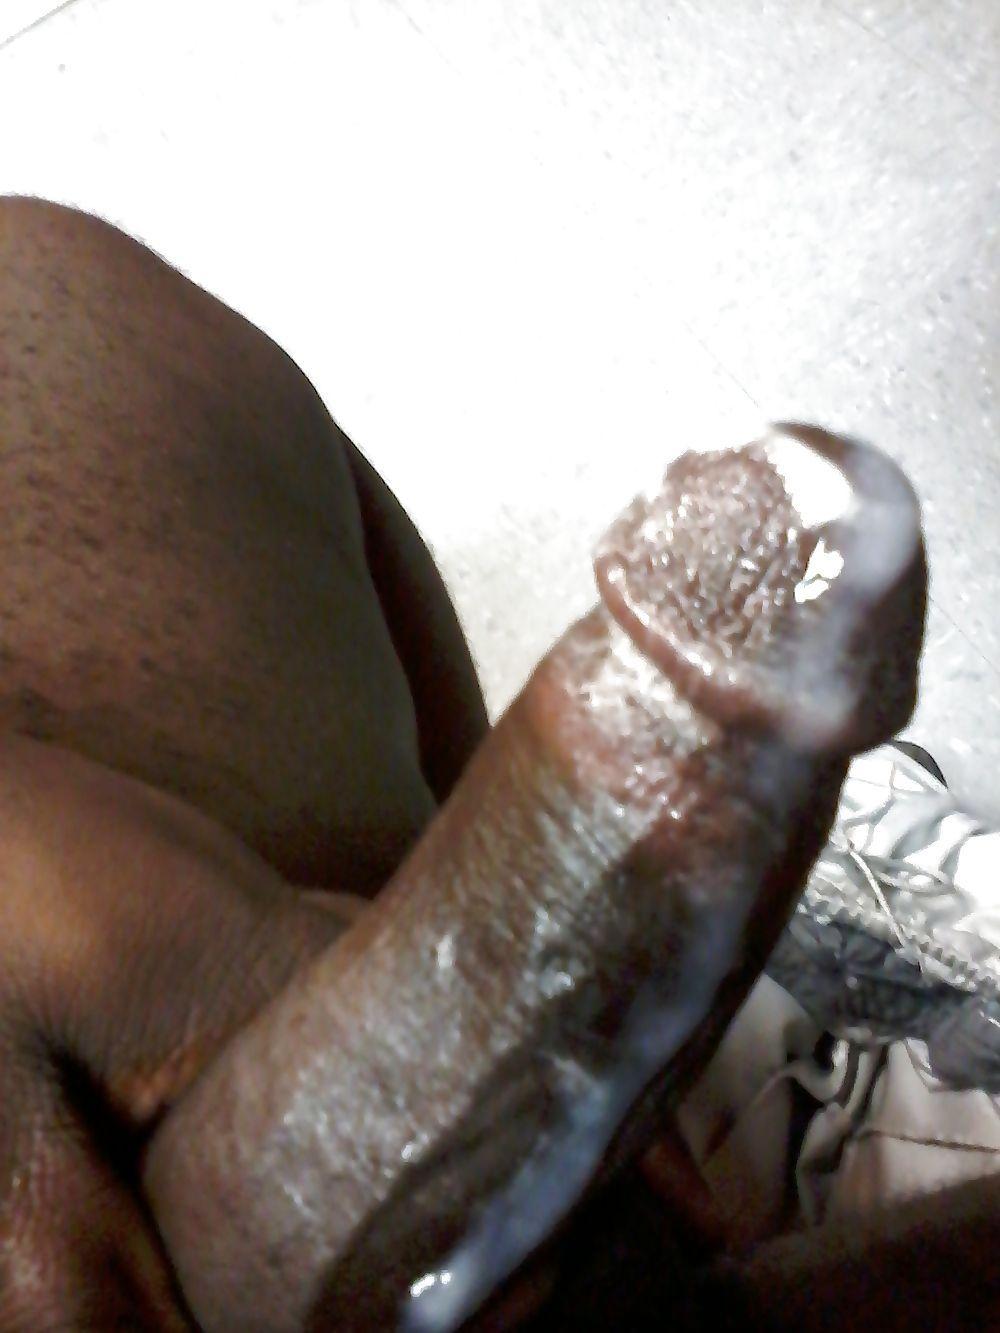 Male glory hole videos